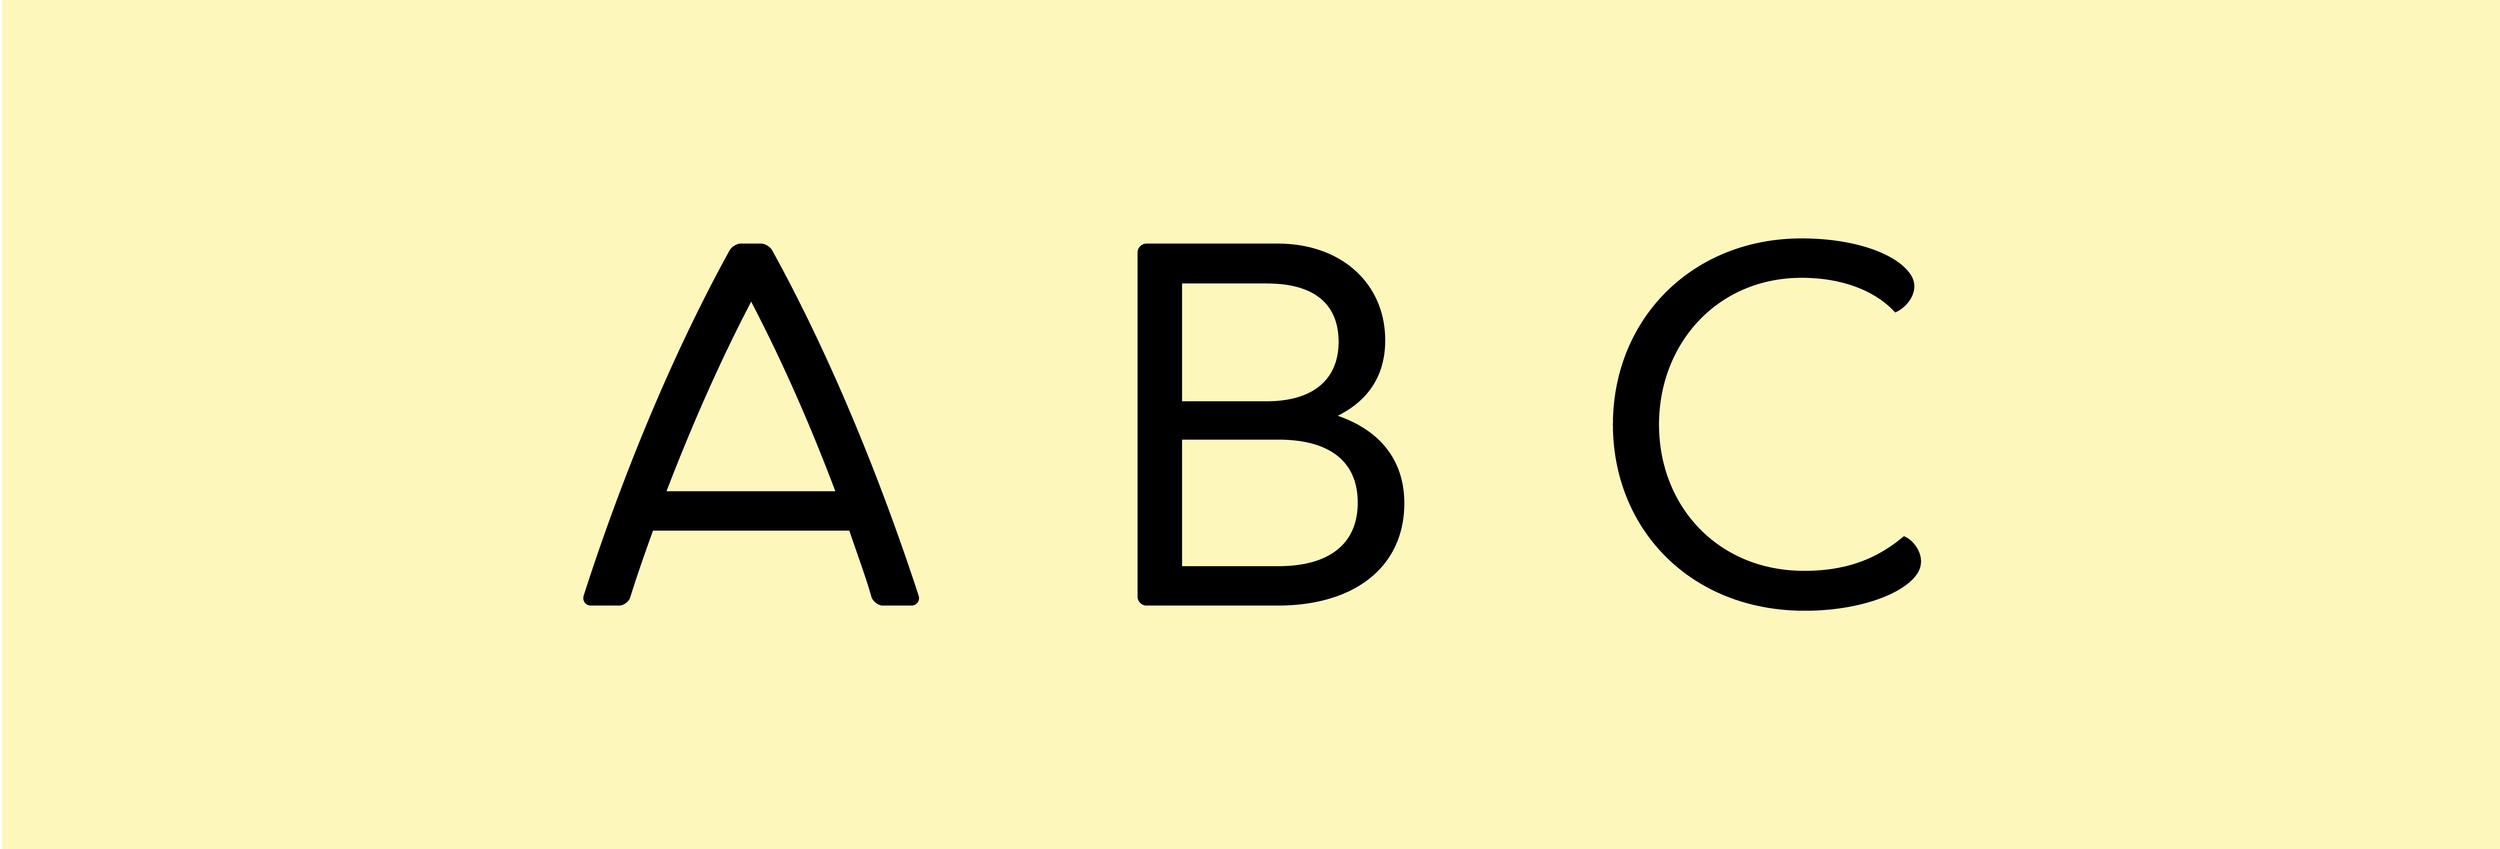 typography-samples-BrushabilitySans.png